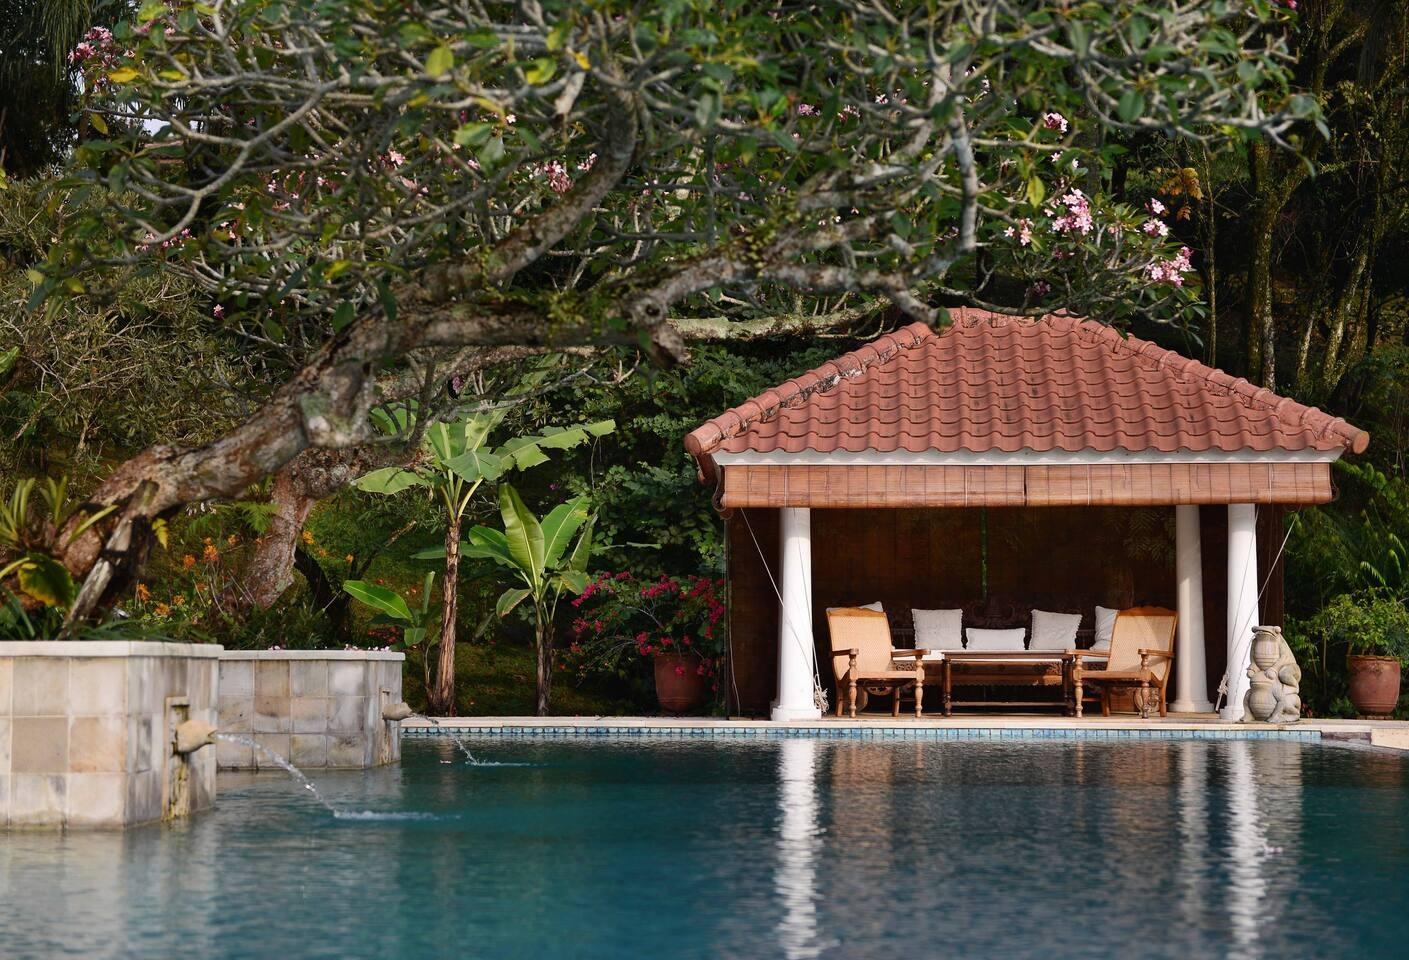 sewa villa di bogor ada kolam renang